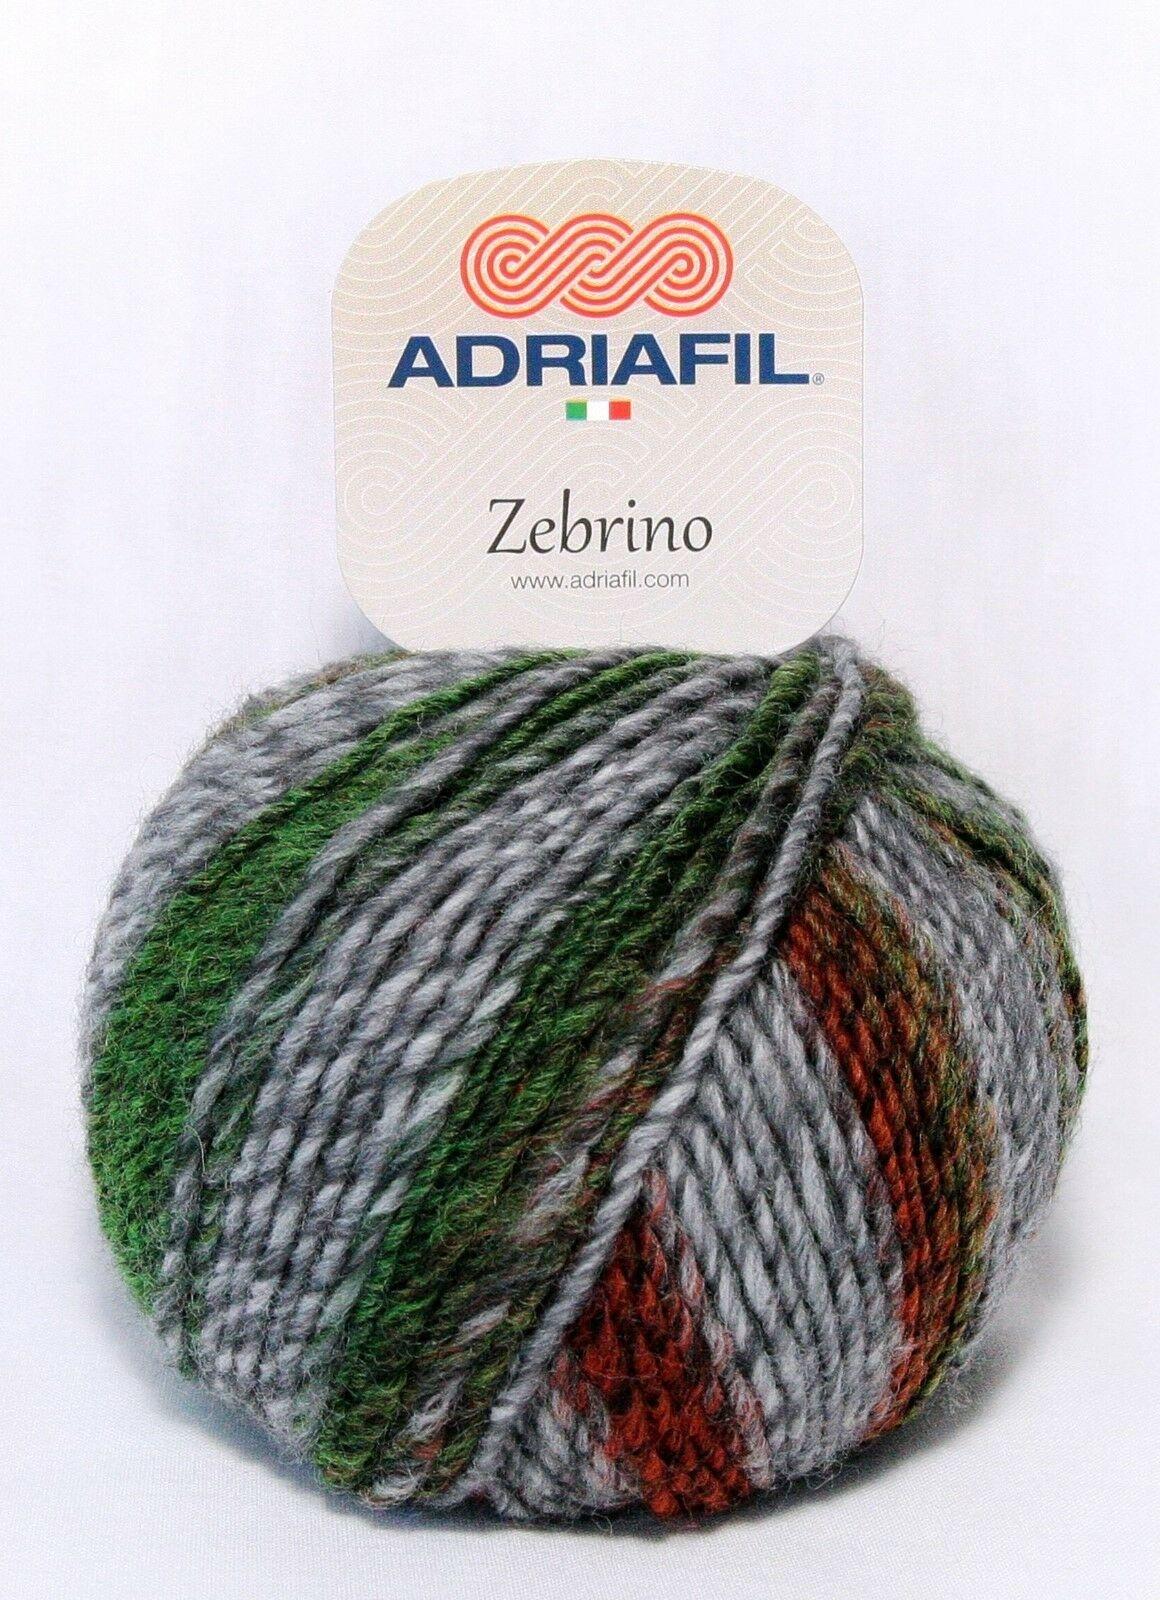 Adriafil Adriafil - Zebrino - 64 - Rood/Groen